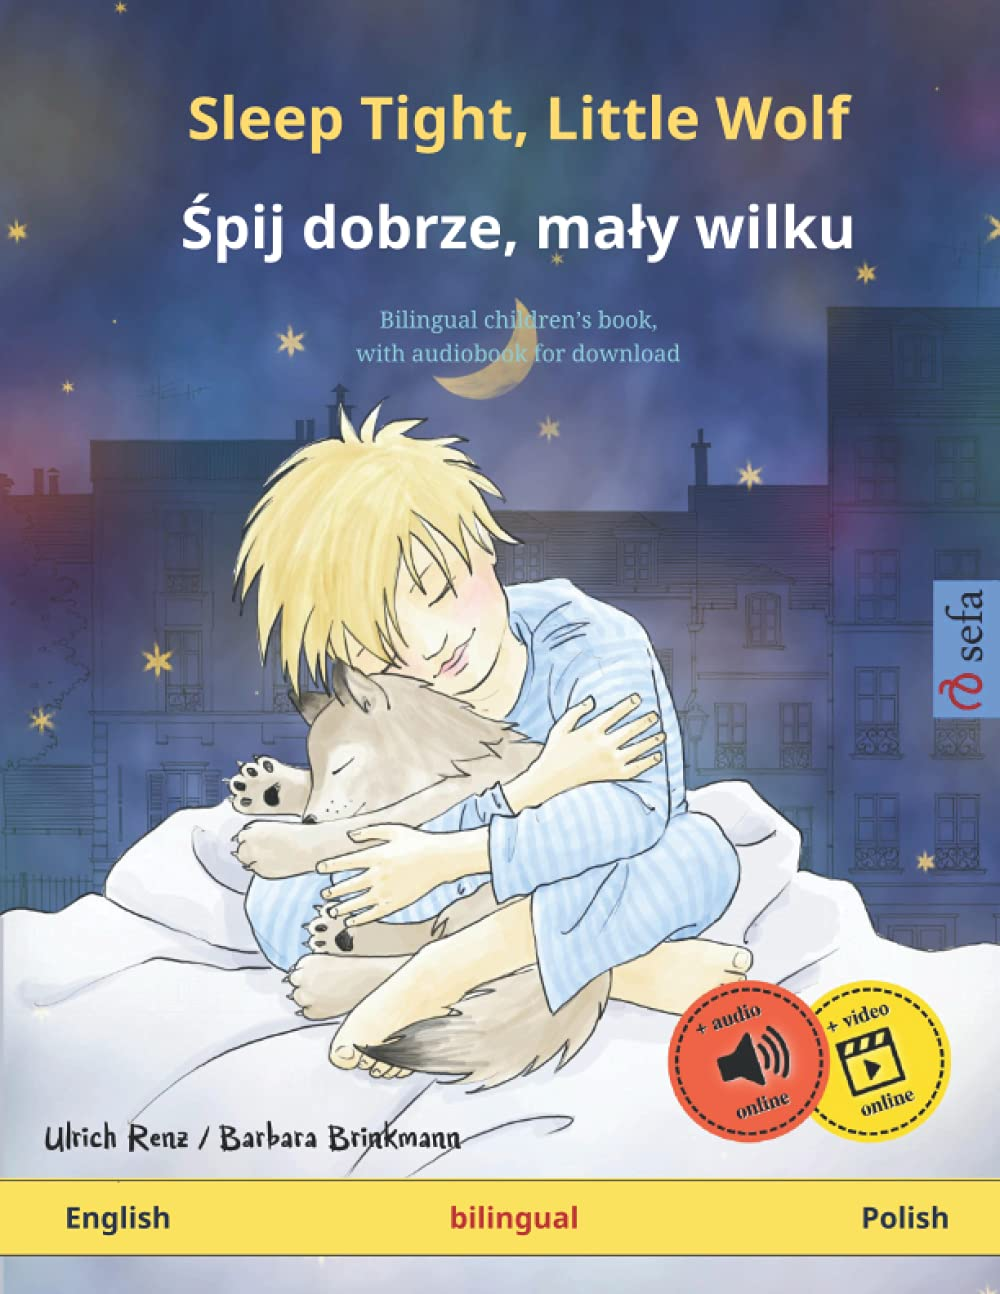 Sleep Tight, Little Wolf – Śpij dobrze, mały wilku (English – Polish): Bilingual children's picture book with audiobook for download (Sefa's Bilingual Picture Books – English / Polish)